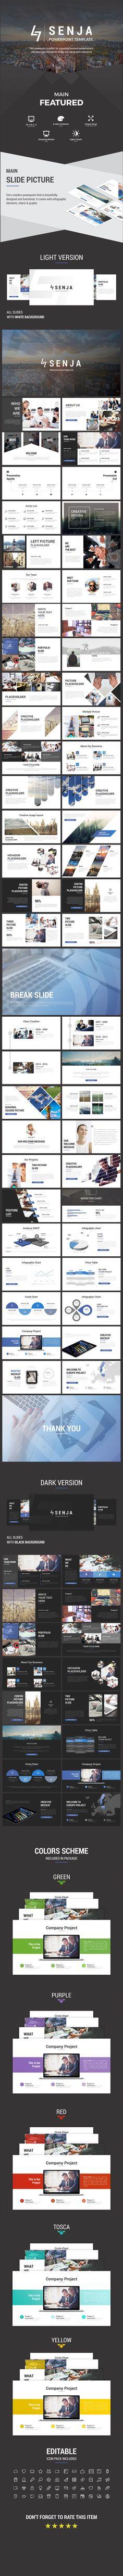 Senja Powerpoint Presentation Template #business #corporate #professional